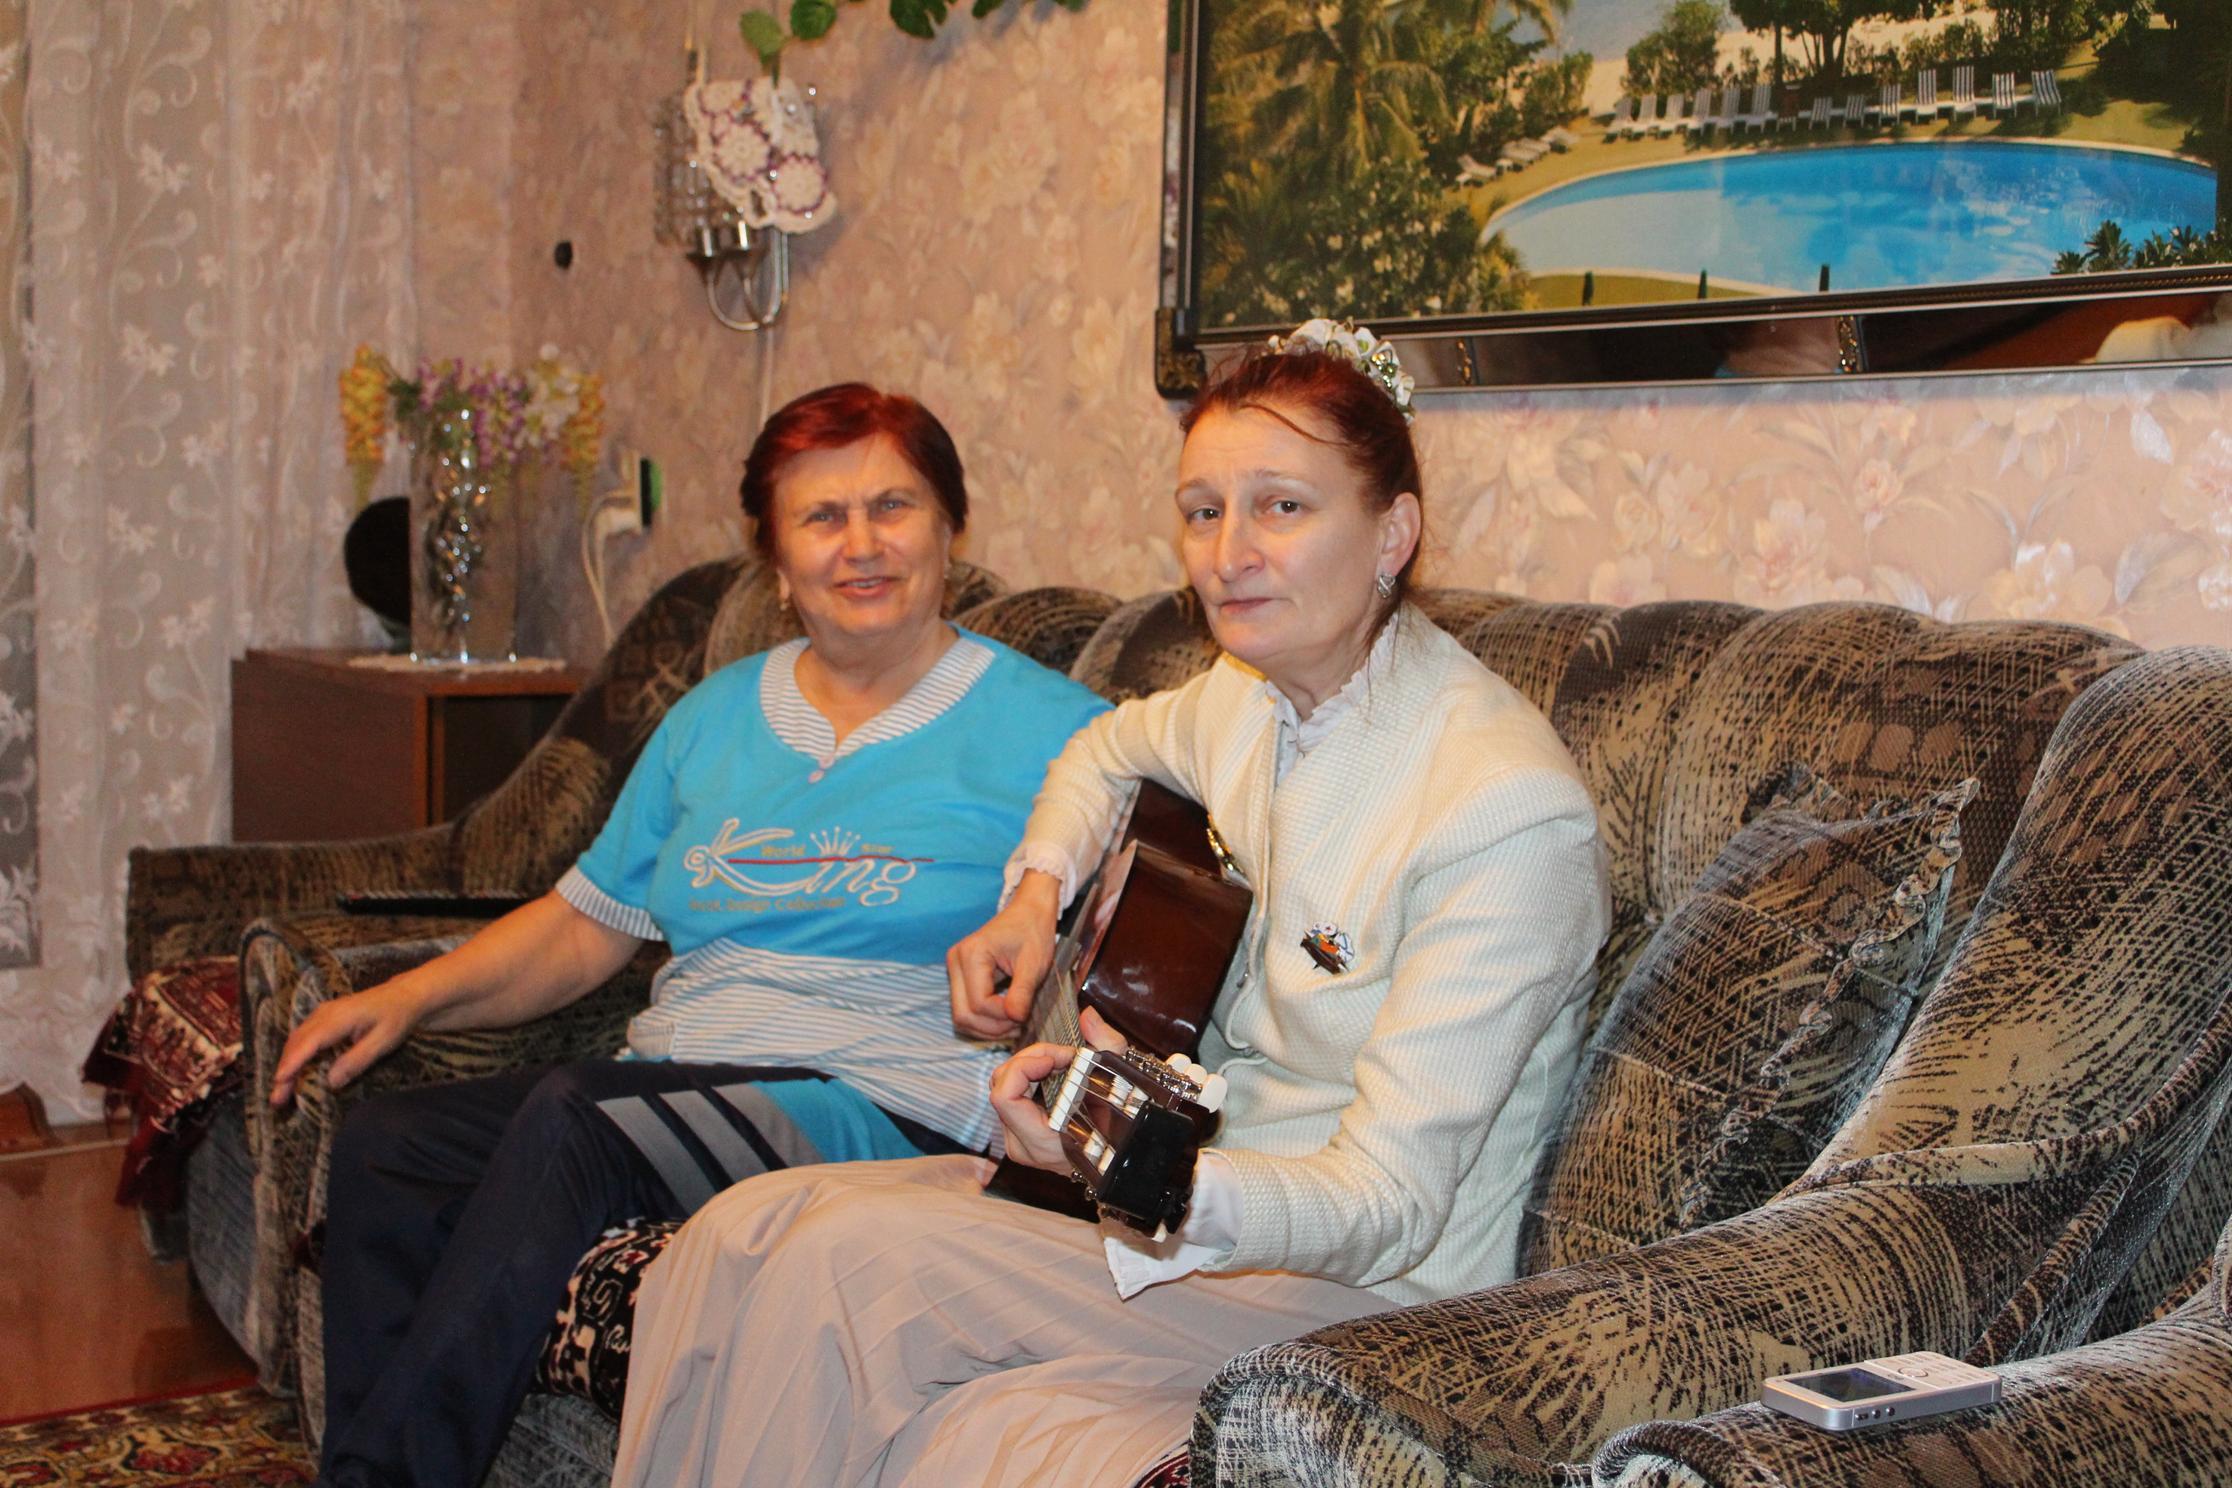 У тети в гостях фото 16 фотография